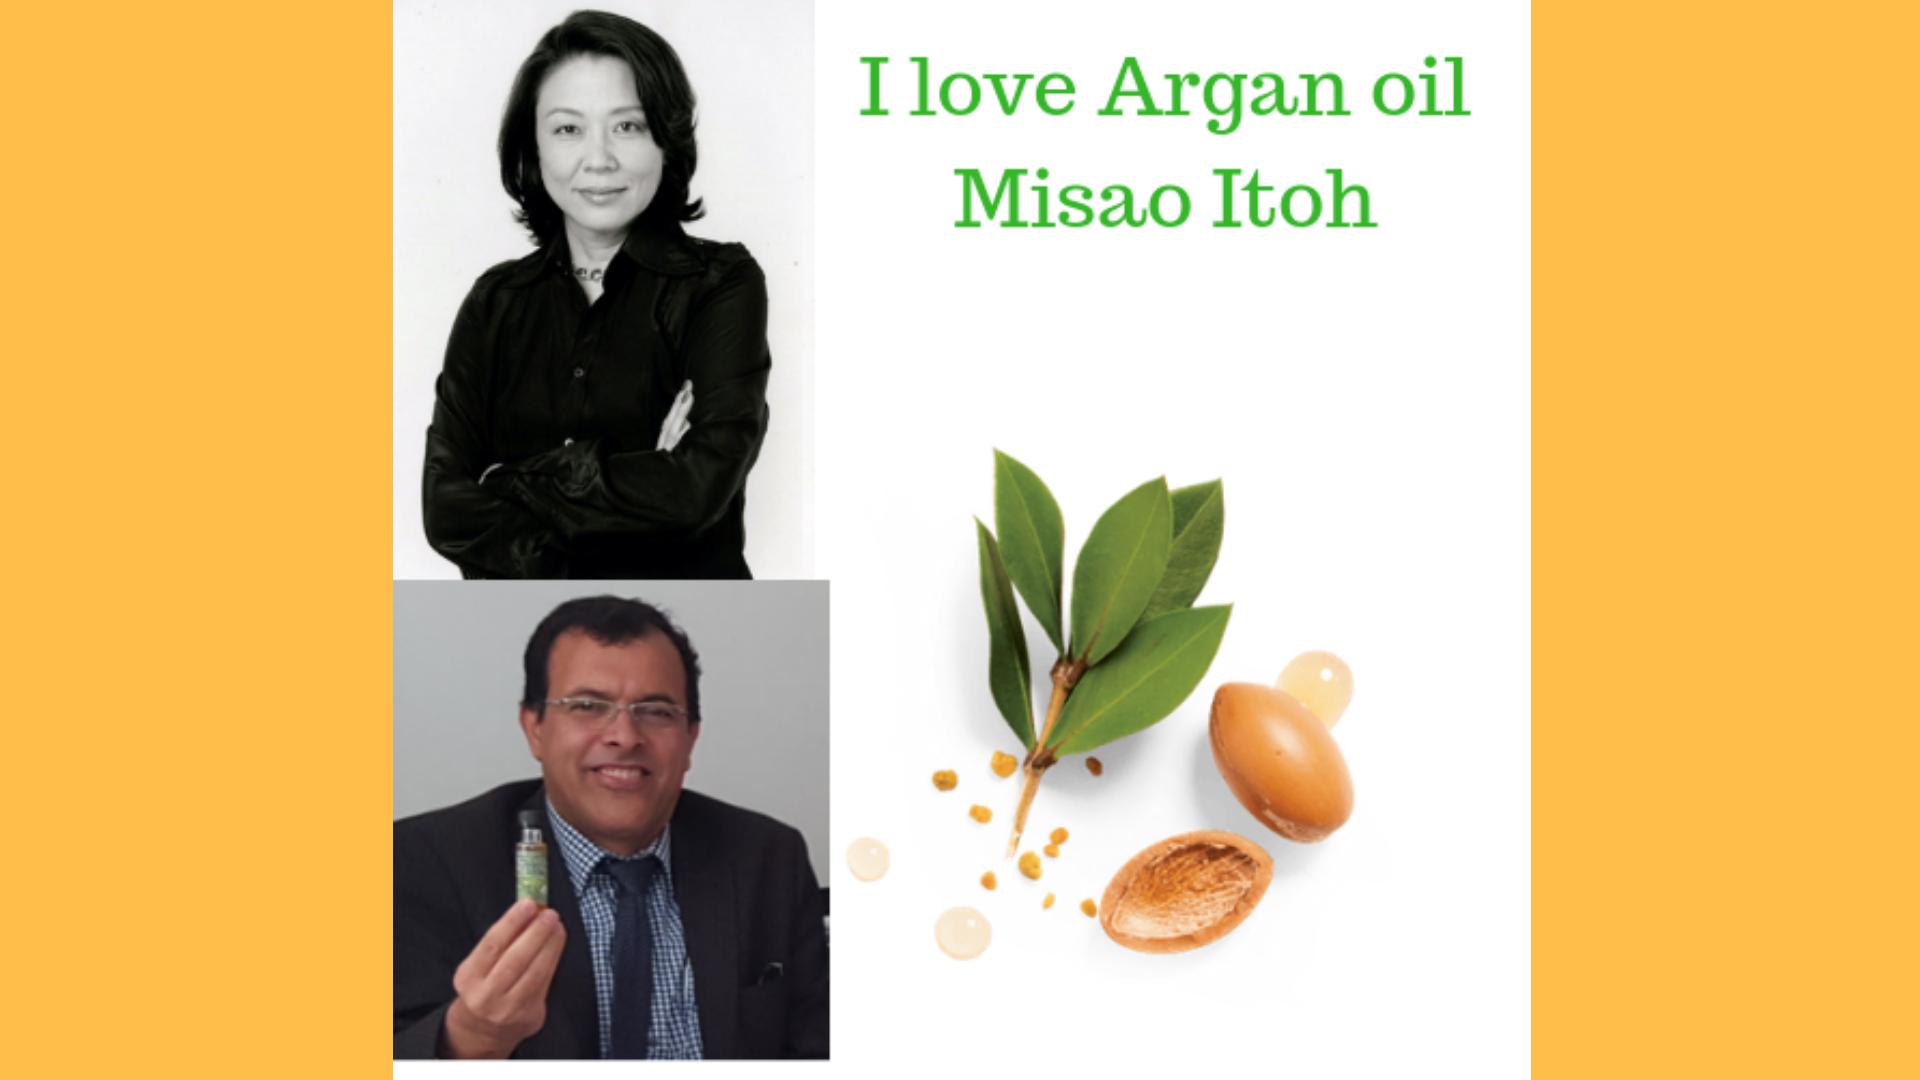 I love Argan oil Misao Itoh